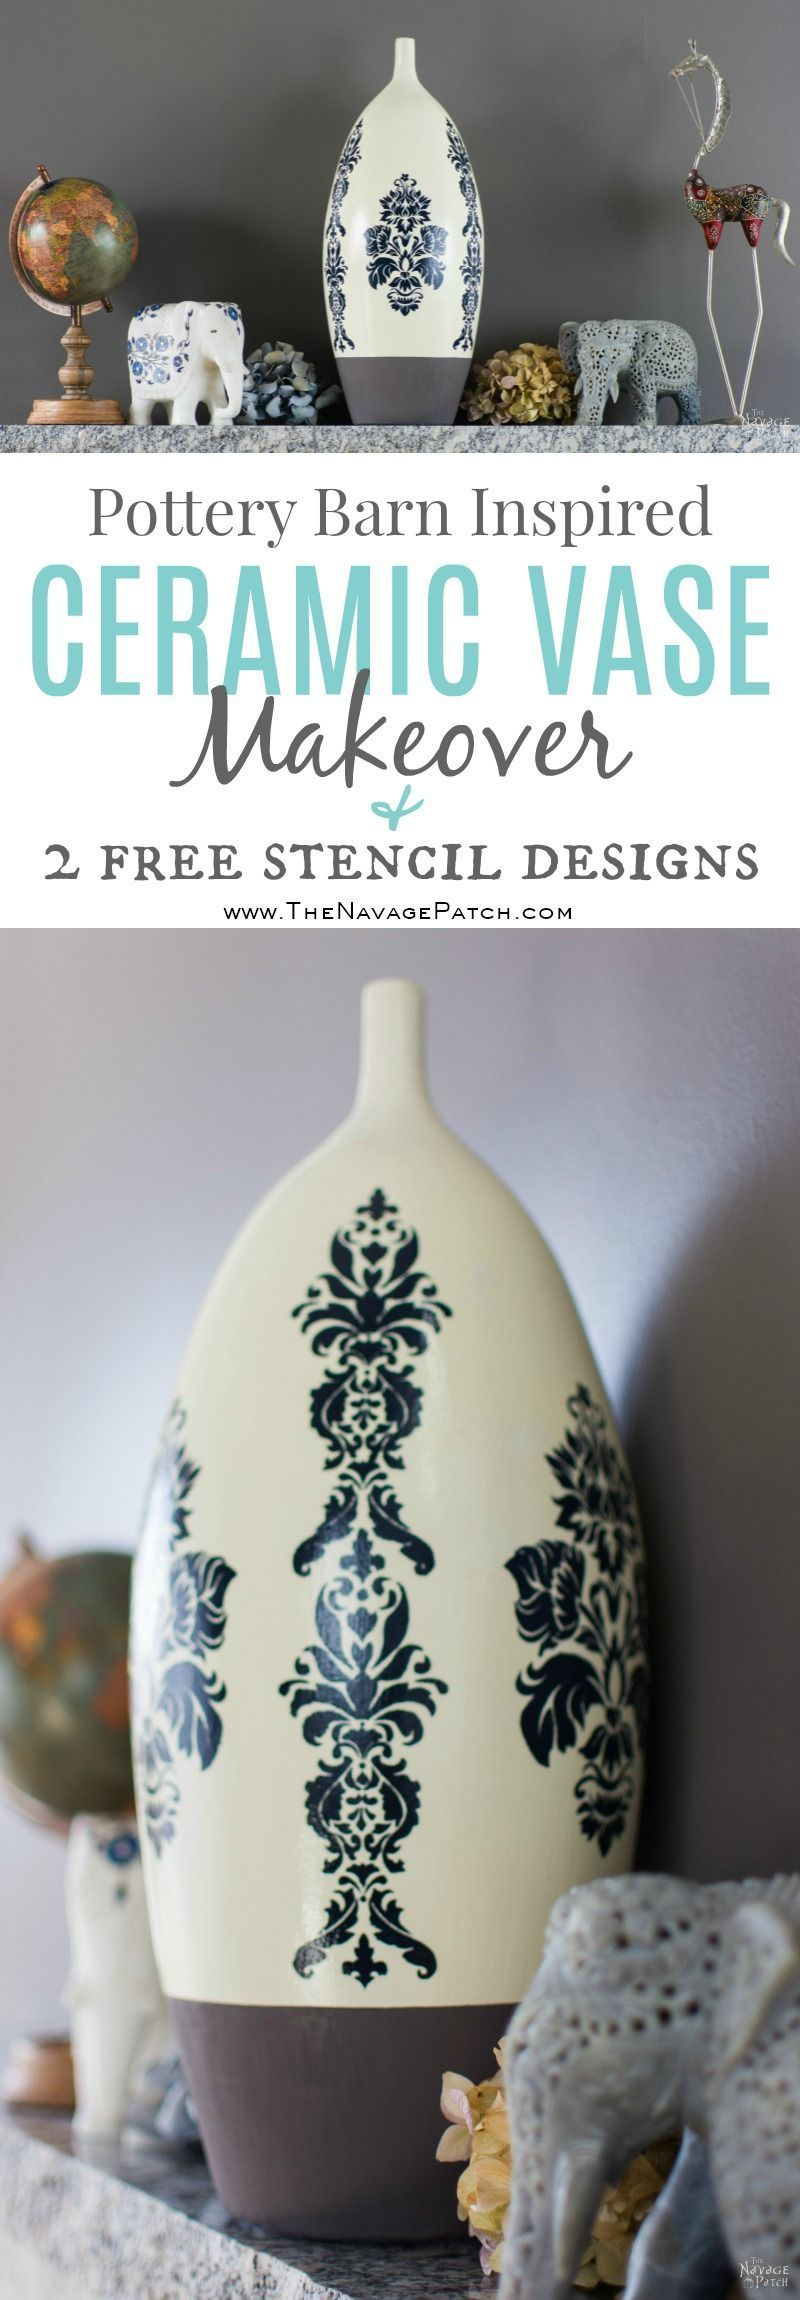 ceramic vase makeover inspired by pottery barn free printable